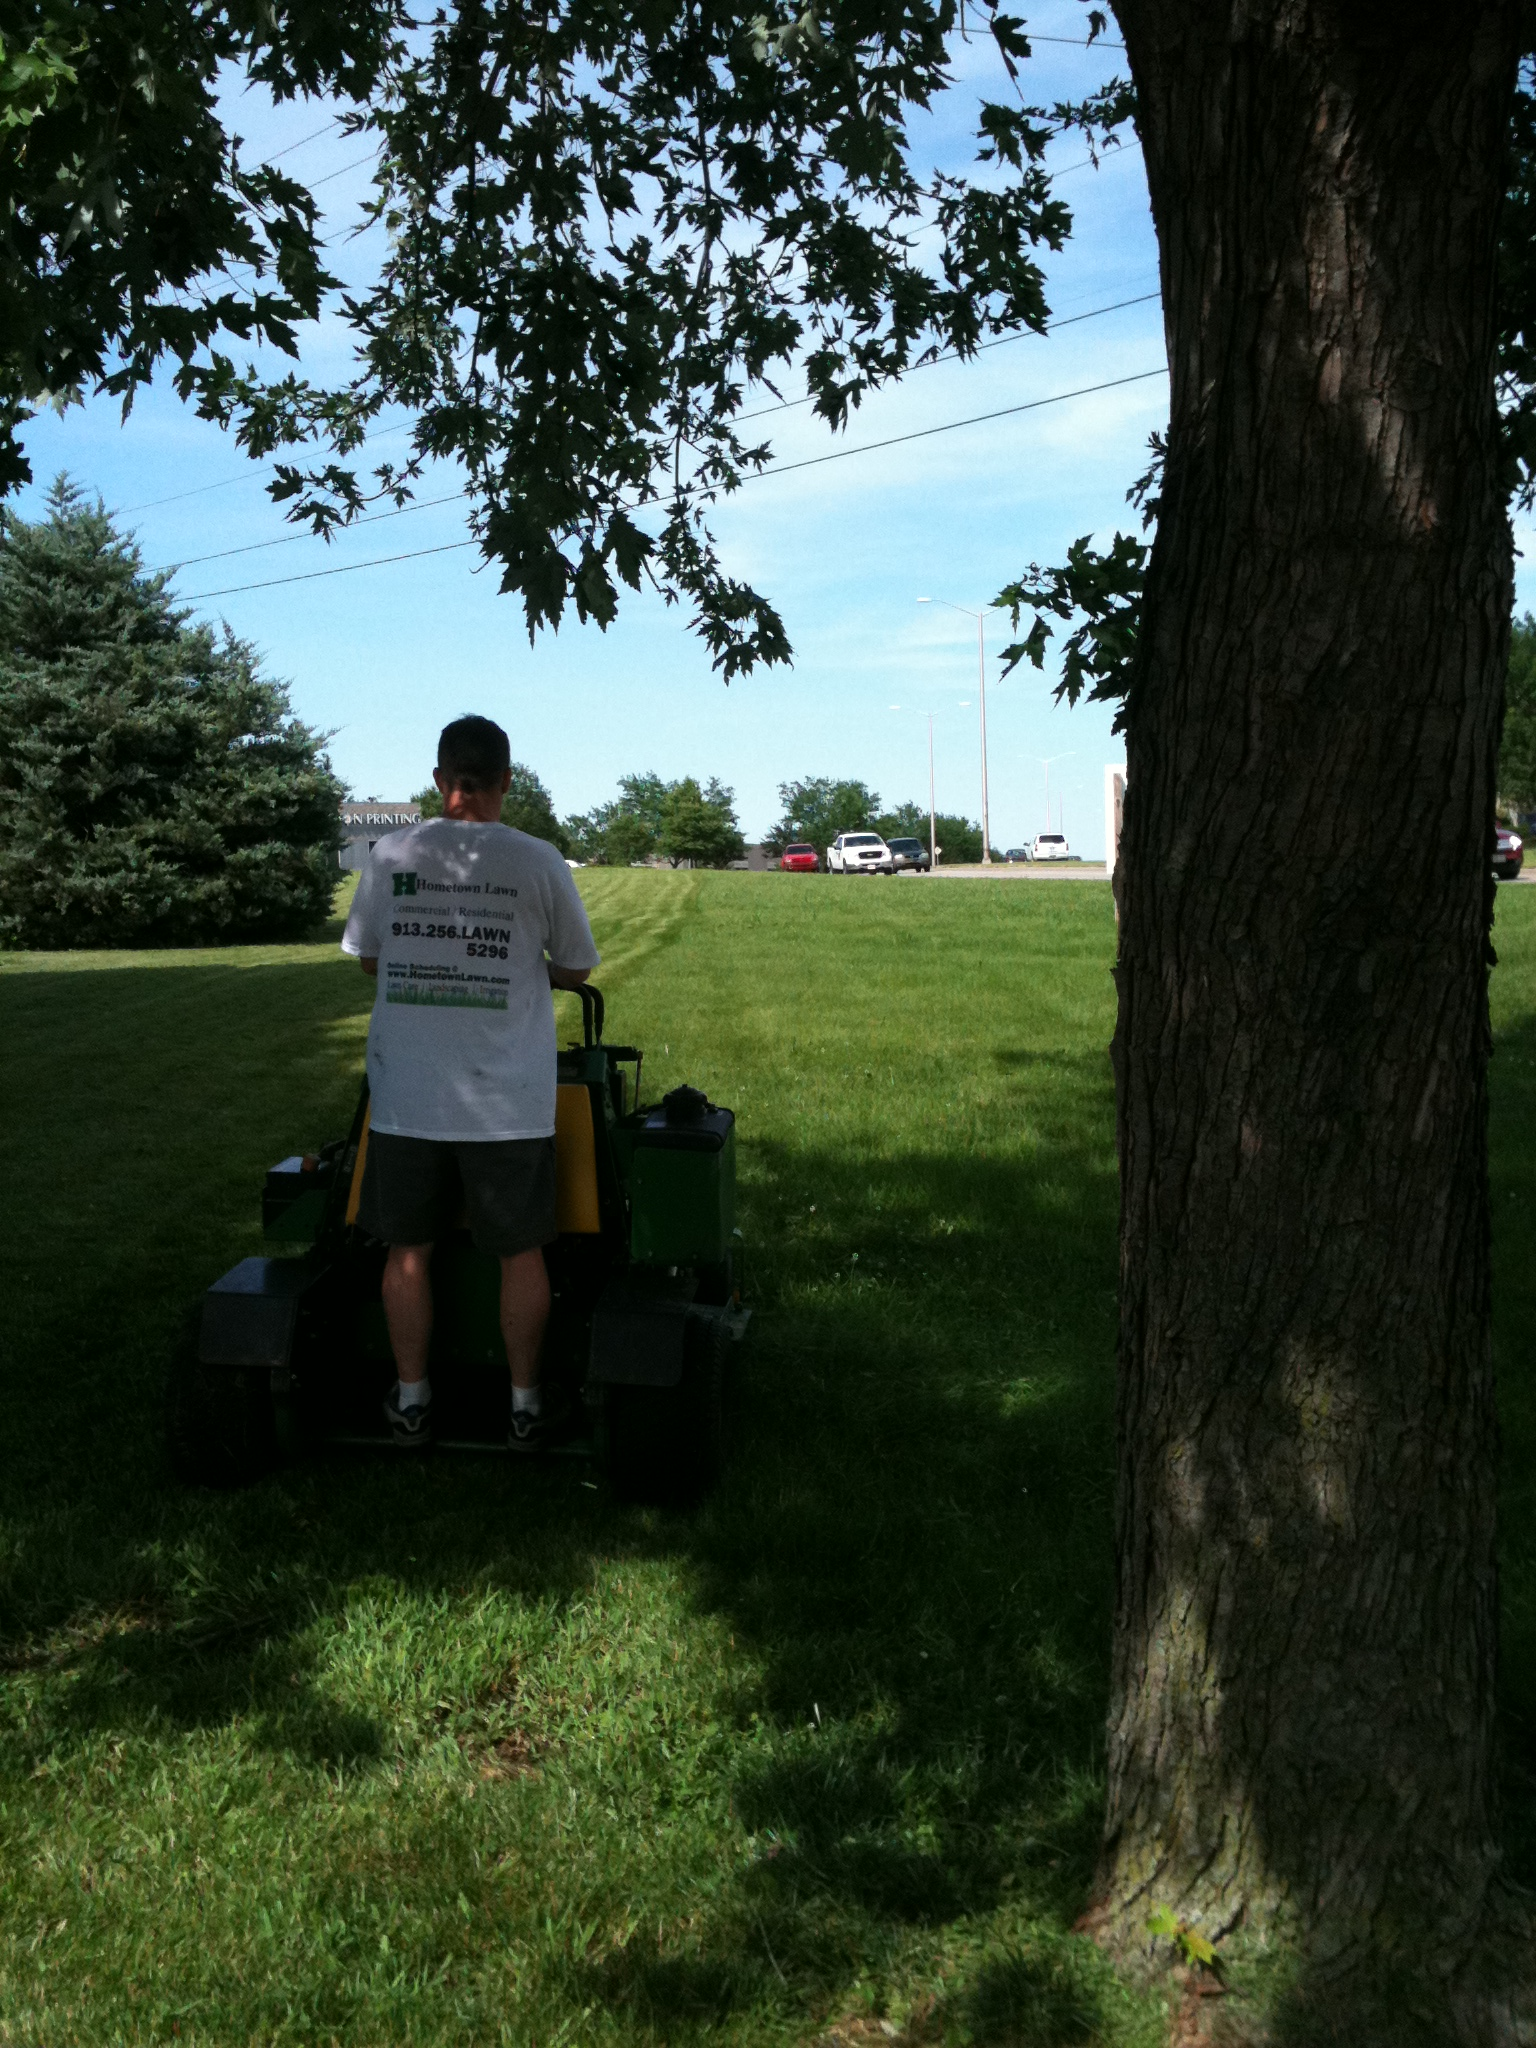 Kansas johnson county prairie village - Lawn Mowing And Care In Olathe Lenexa Overland Park Leawood Shawnee Mission Merriam Gardner Spring Hill Fairway Prairie Village Johnson County